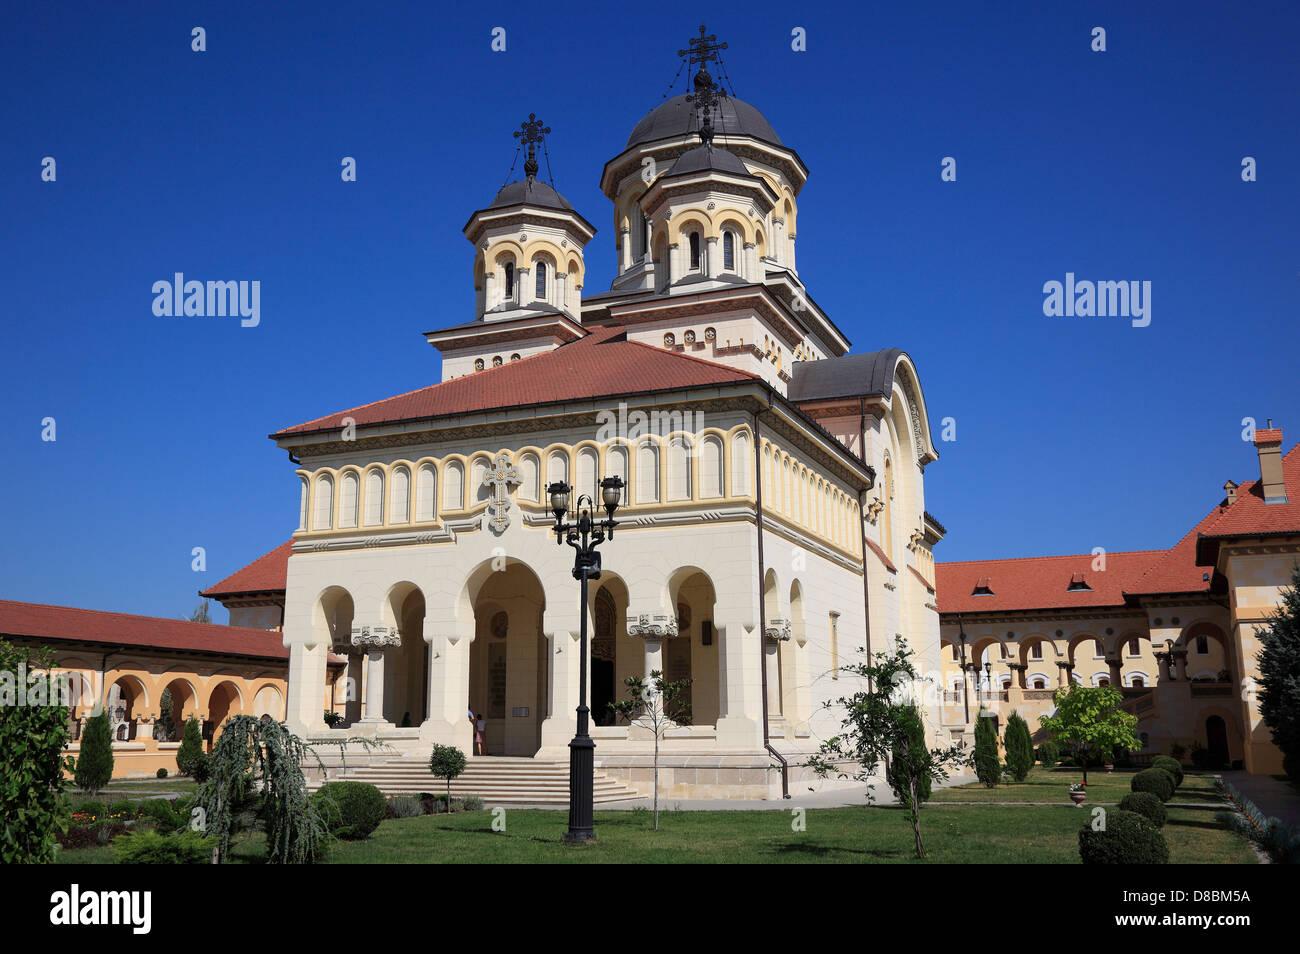 coronation cathedral of the Romanian Orthodox Church, Alba Iulia, Balgrad, Transylvania, Romania. Stock Photo